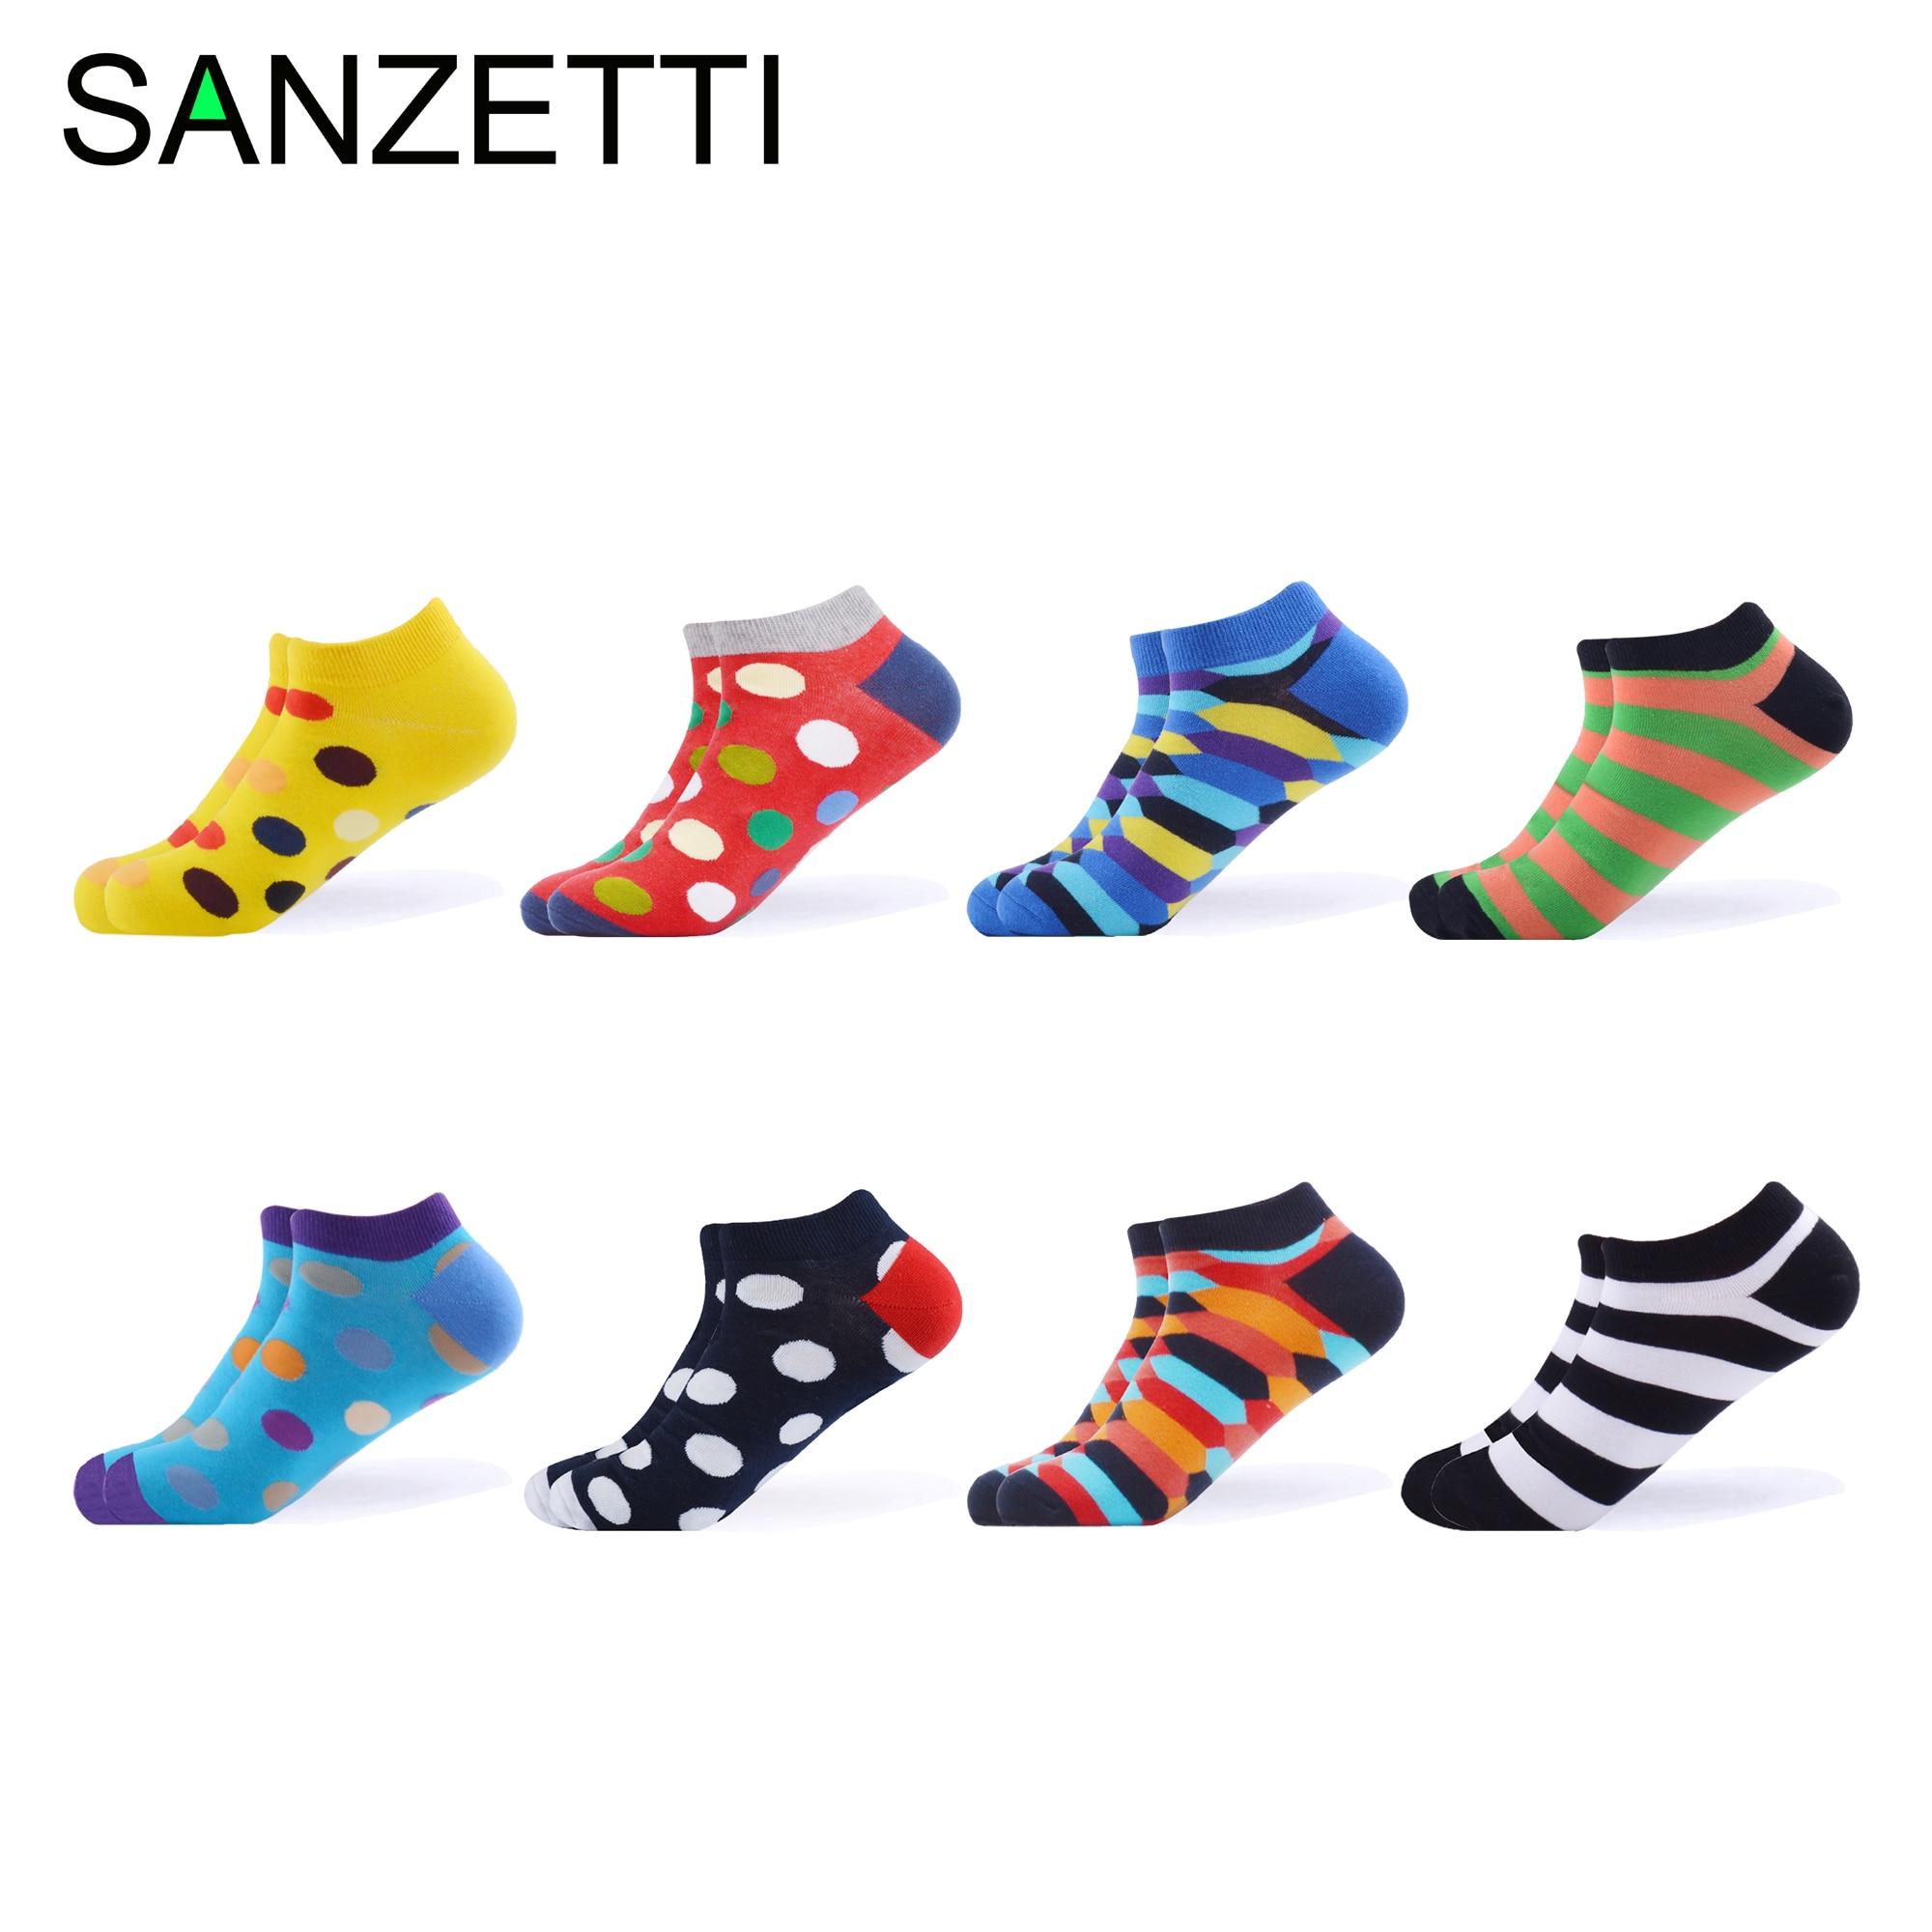 Underwear & Sleepwears Anzetti 6 Pairs/lot Men Women Casual Ankle Socks Combed Cotton Socks Black White Red Plaid Stripes Geometric Pattern Boat Socks